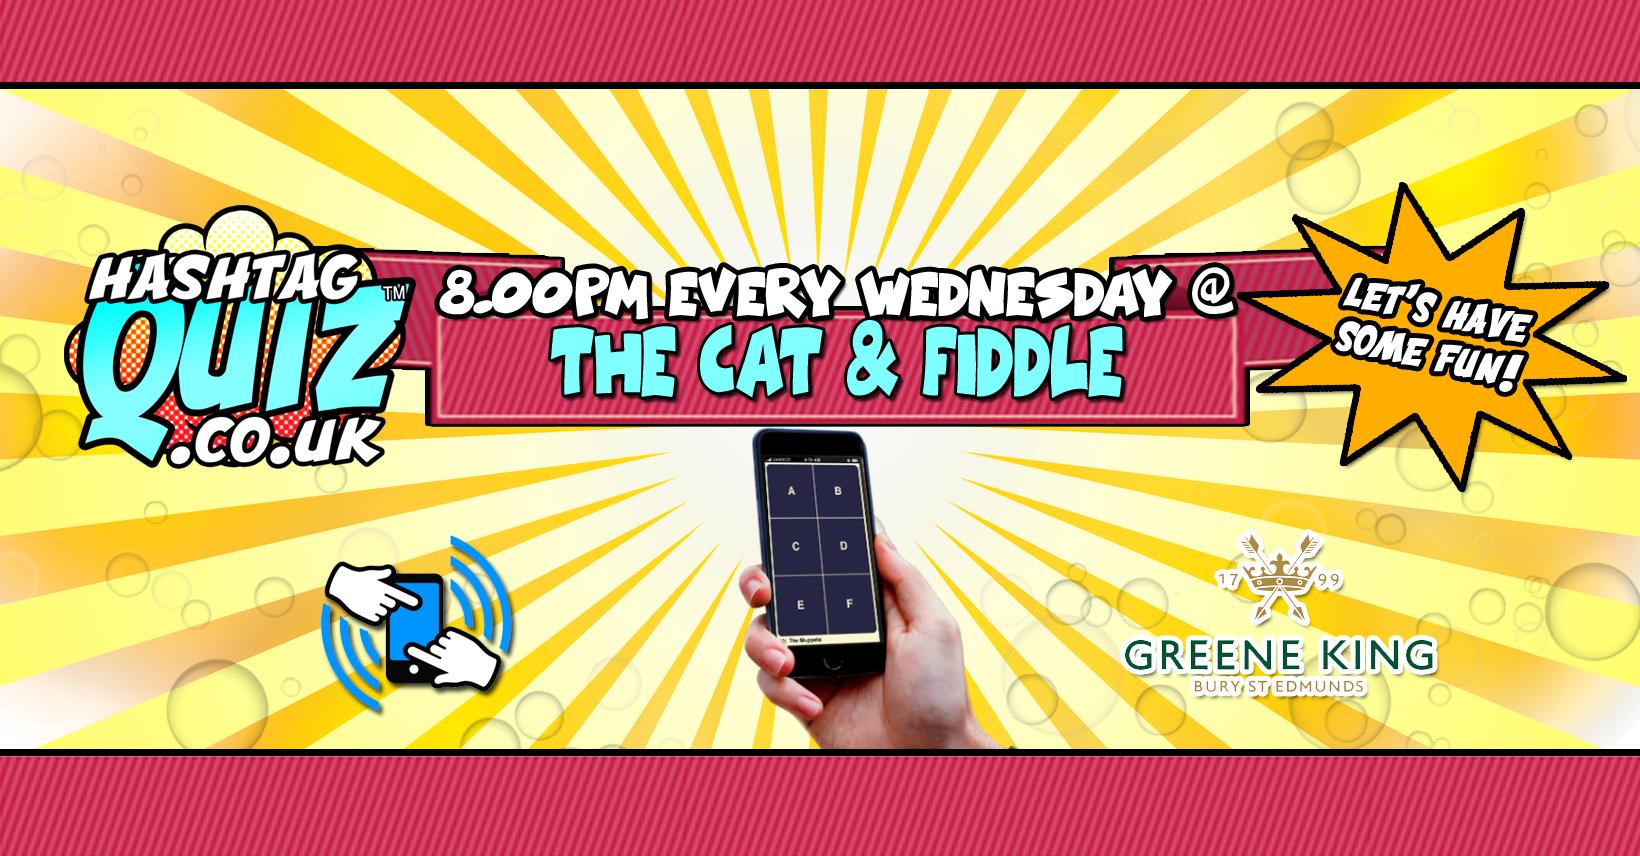 Smartphone Quiz Night - The Cat & Fiddle, Ilk